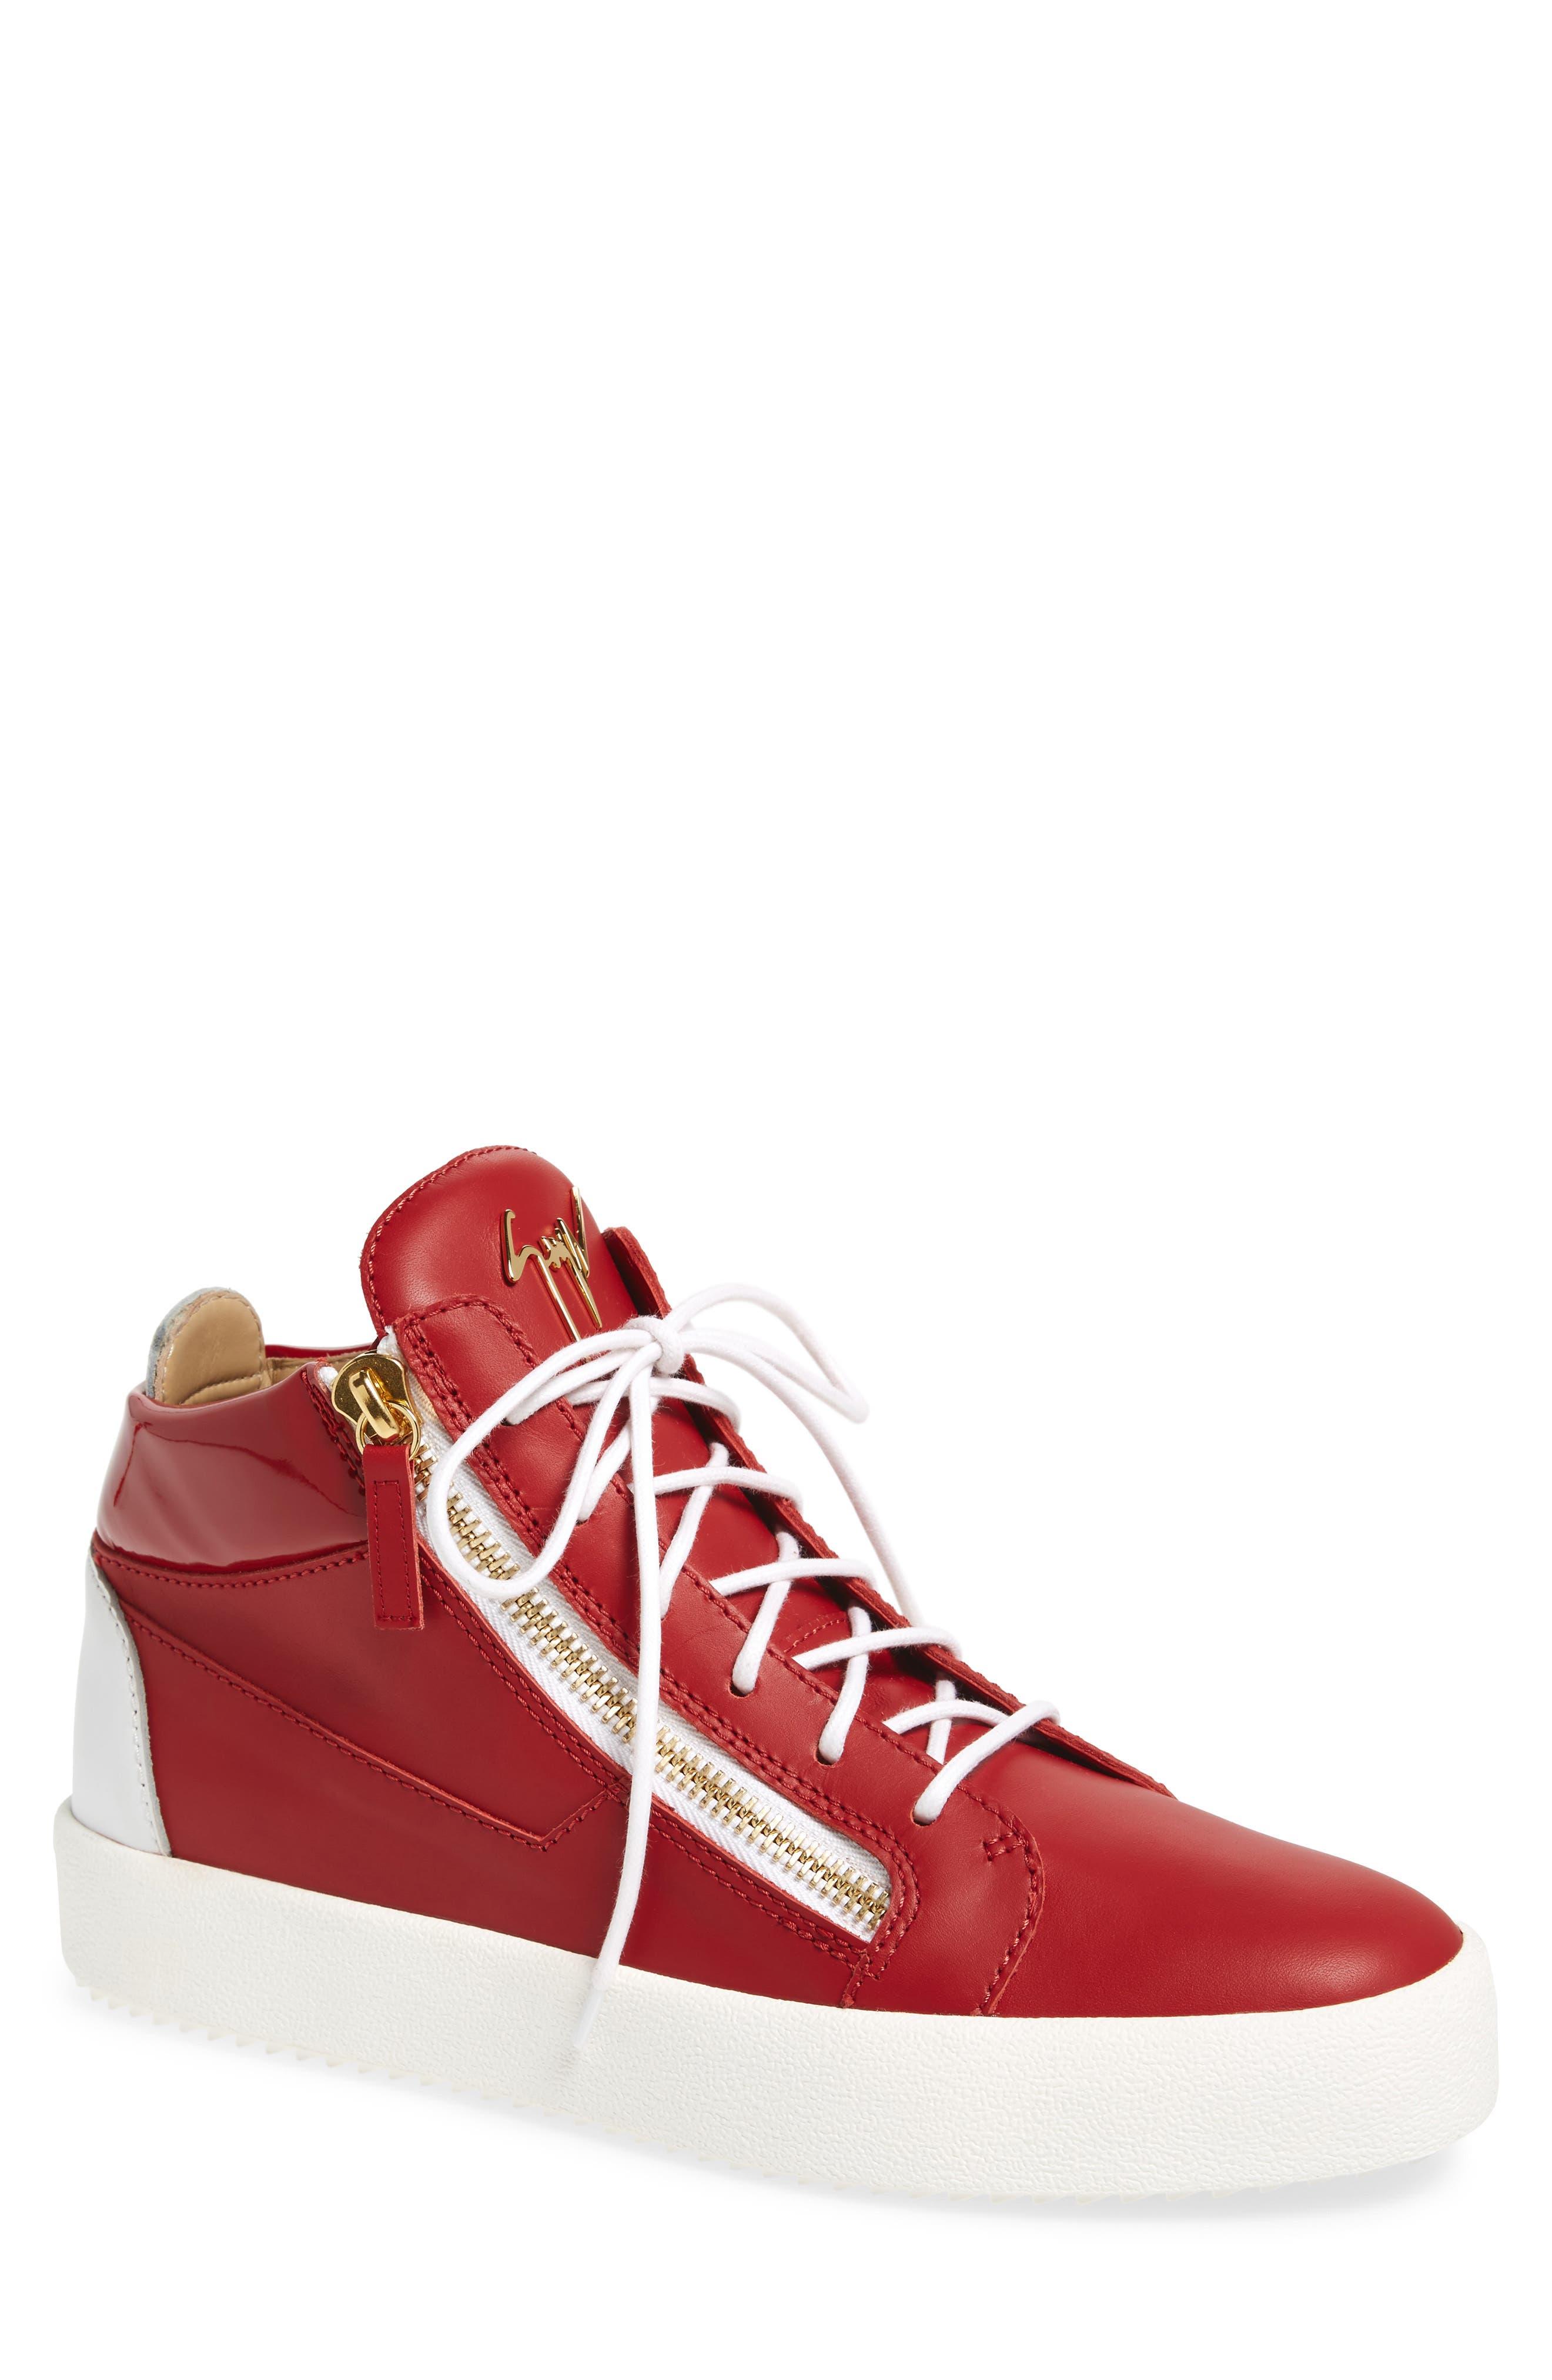 Double Zipper Mid Top Sneaker,                             Main thumbnail 1, color,                             600